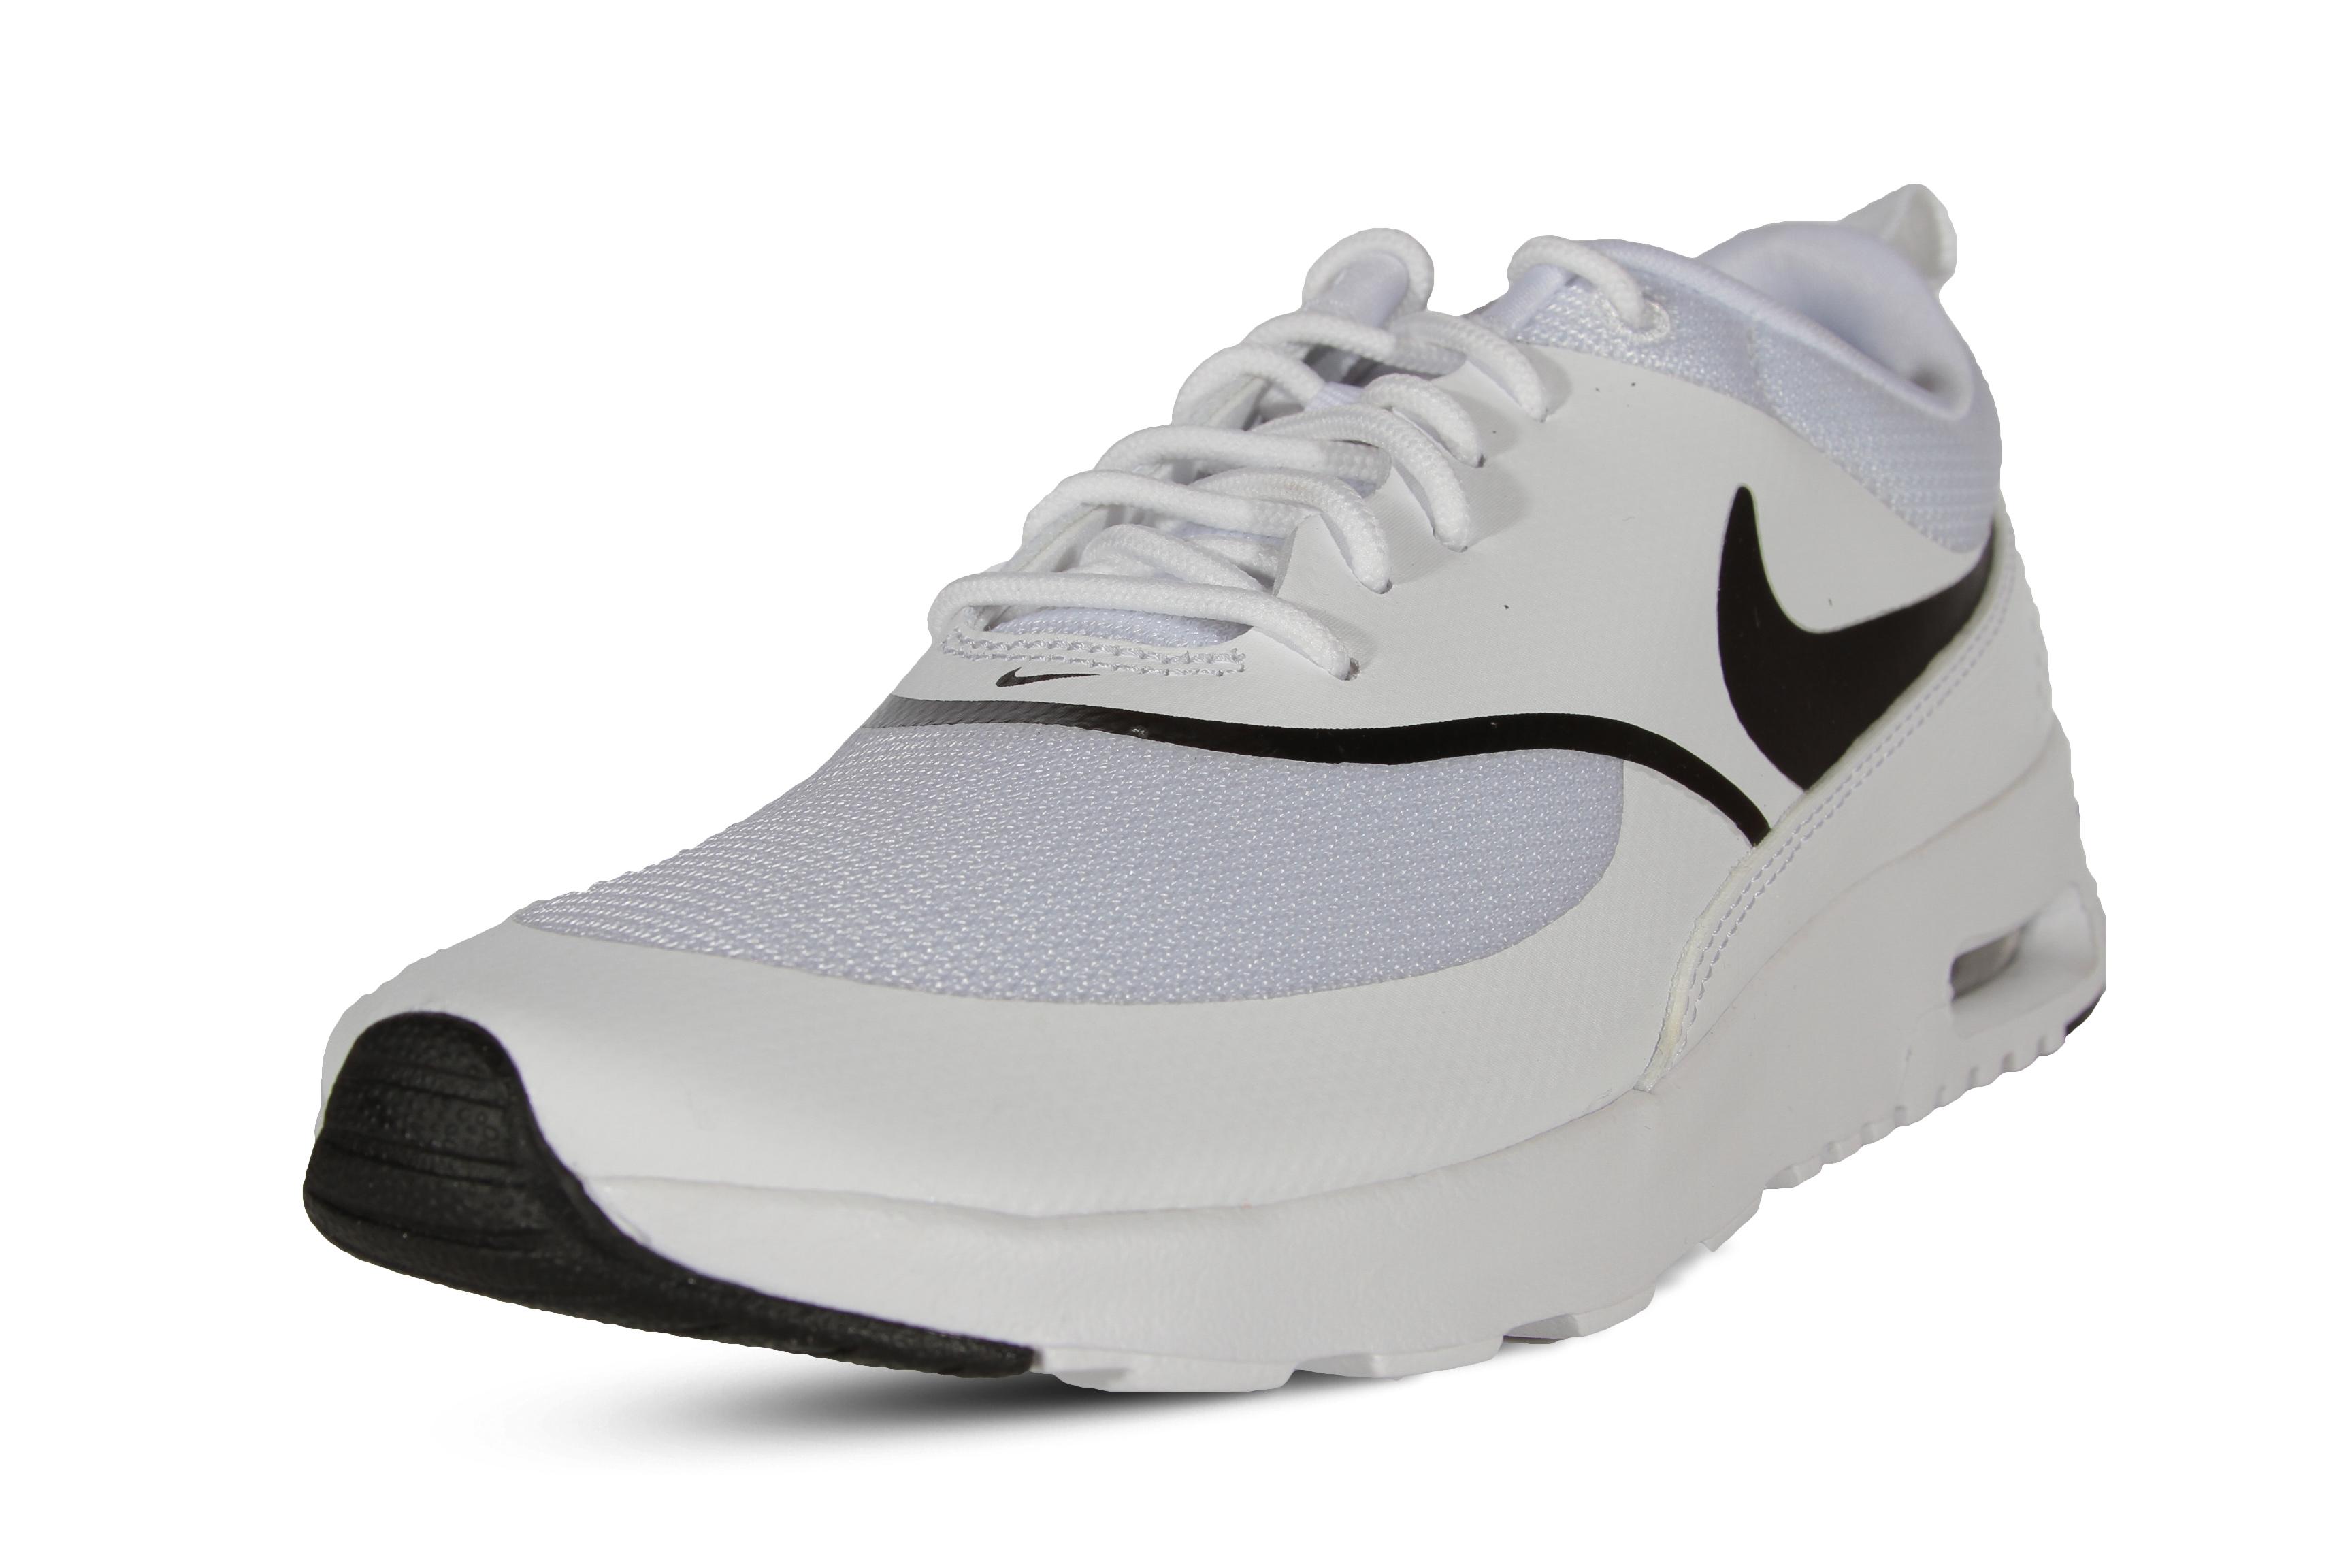 Femme Nike Air Max Thea Running Chaussures 599409-108